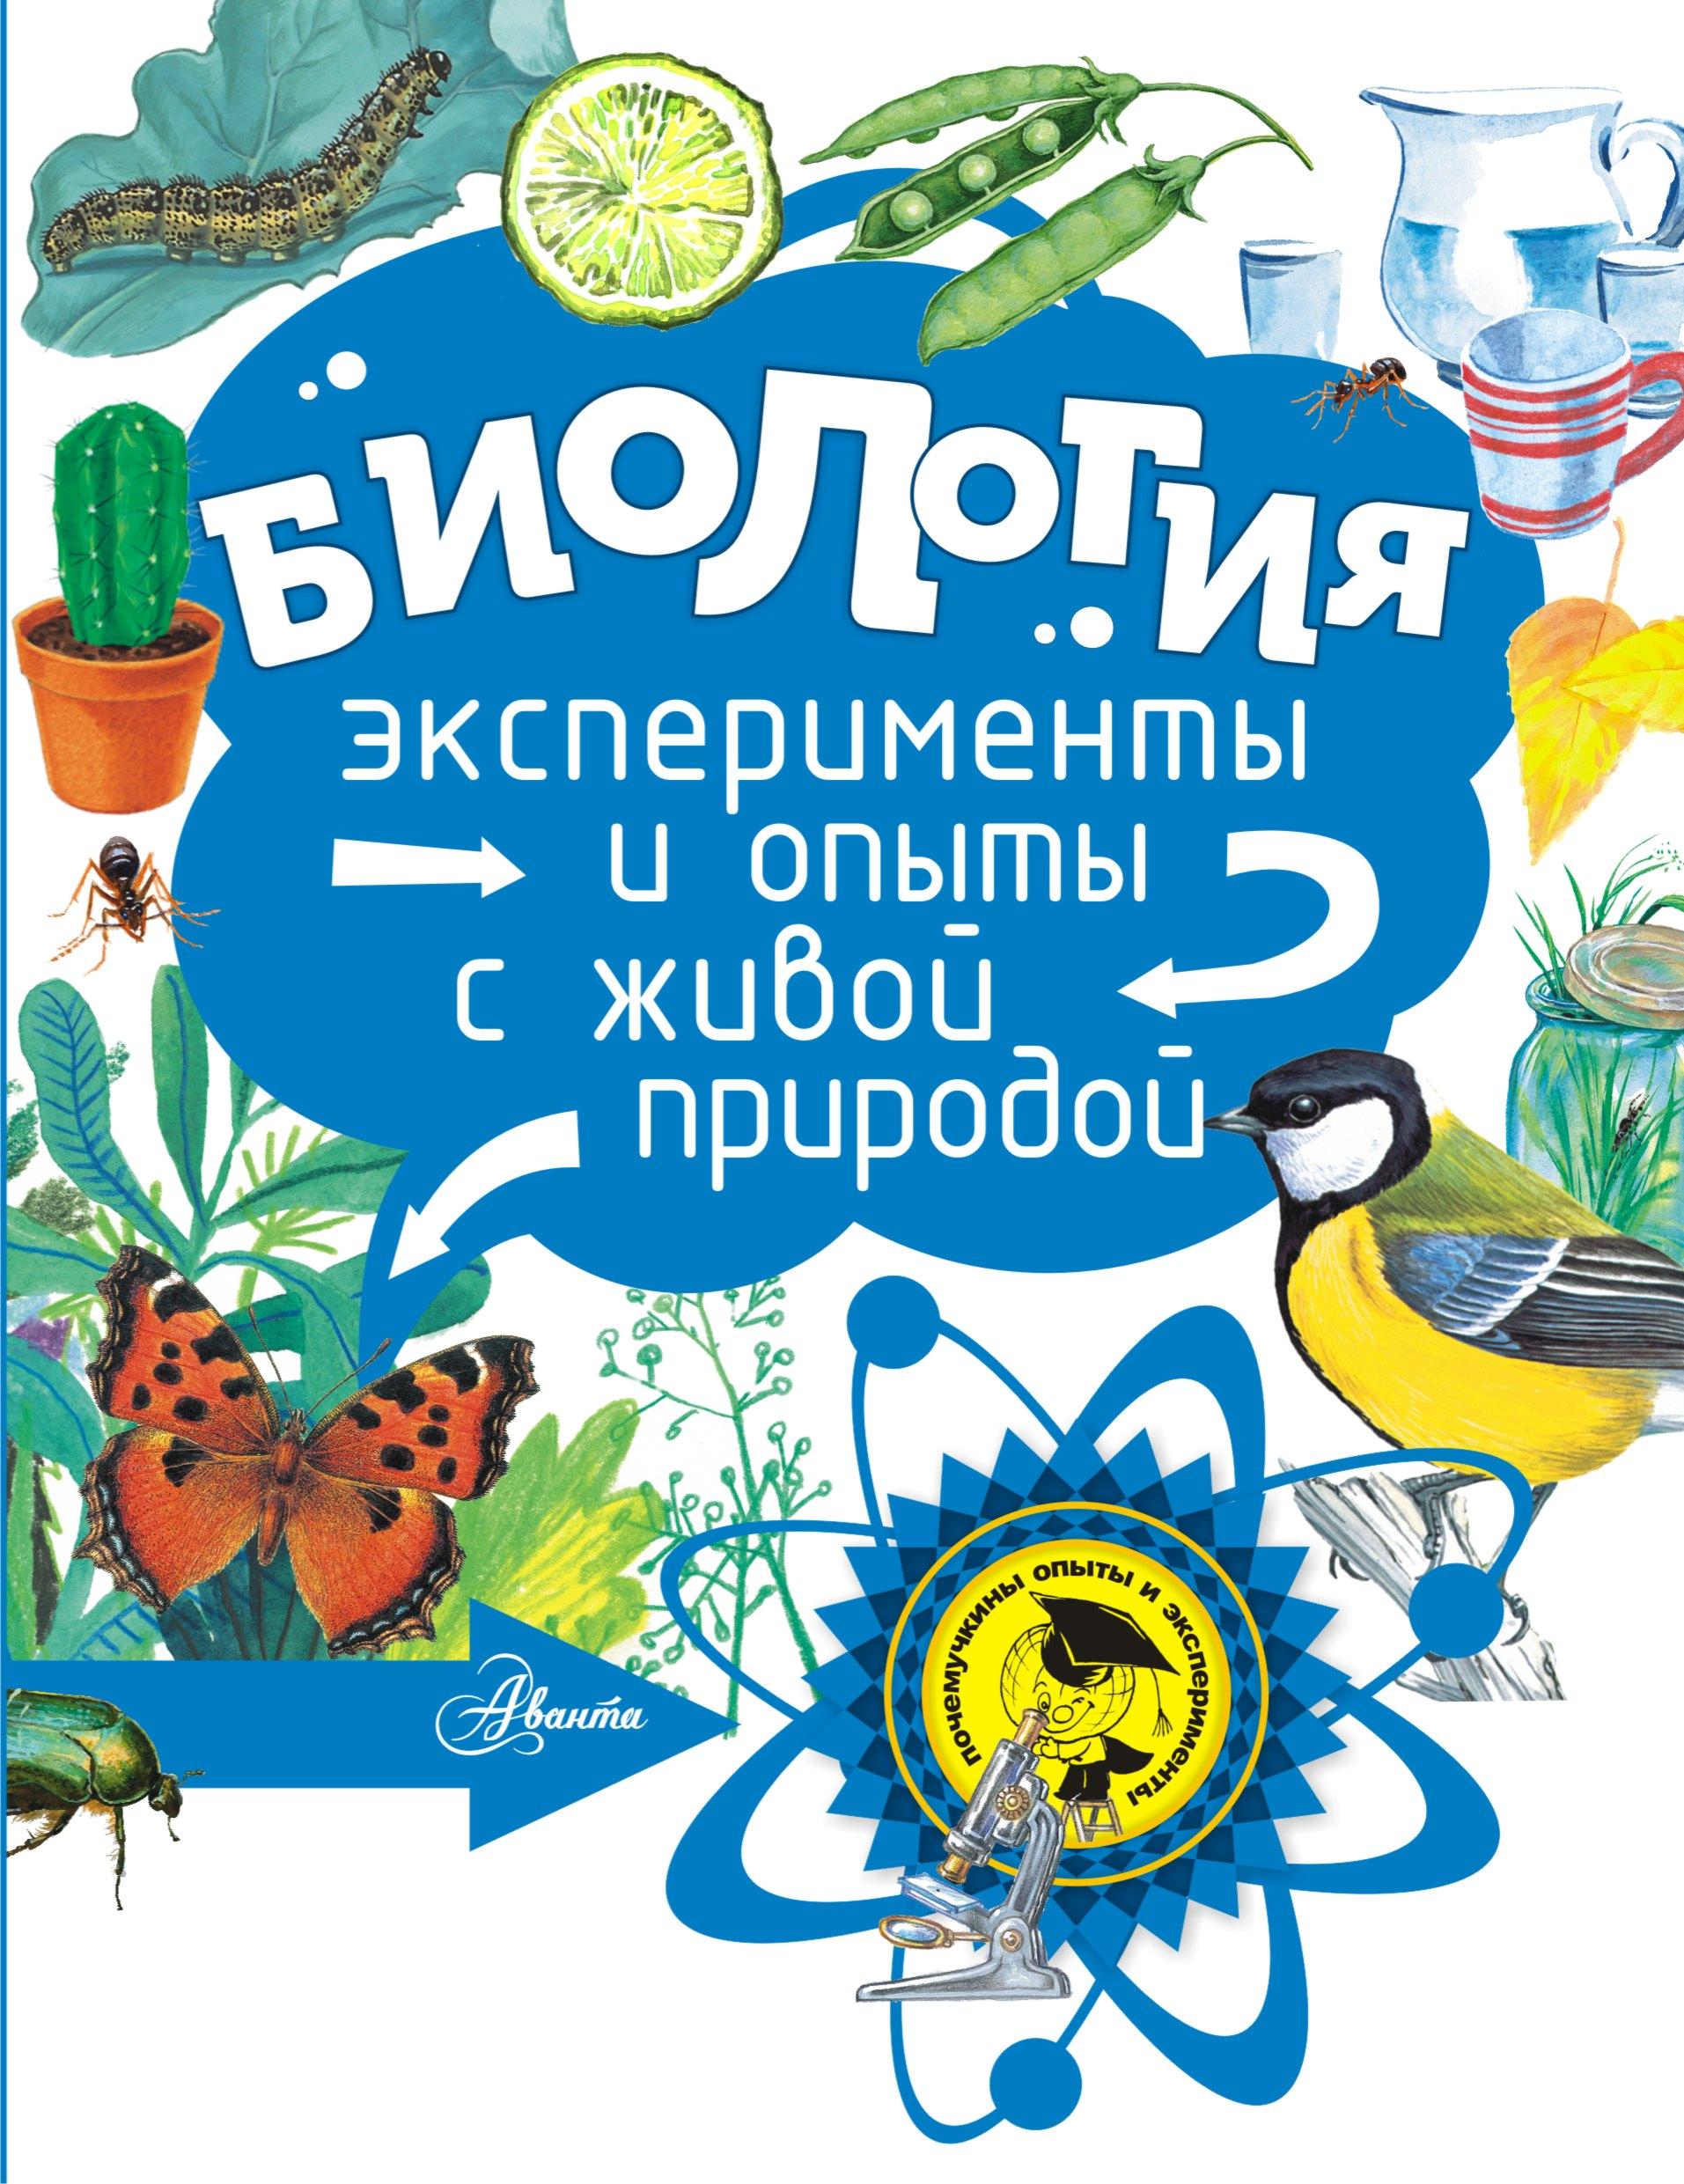 Биология ( Григорьев О.Е.  )